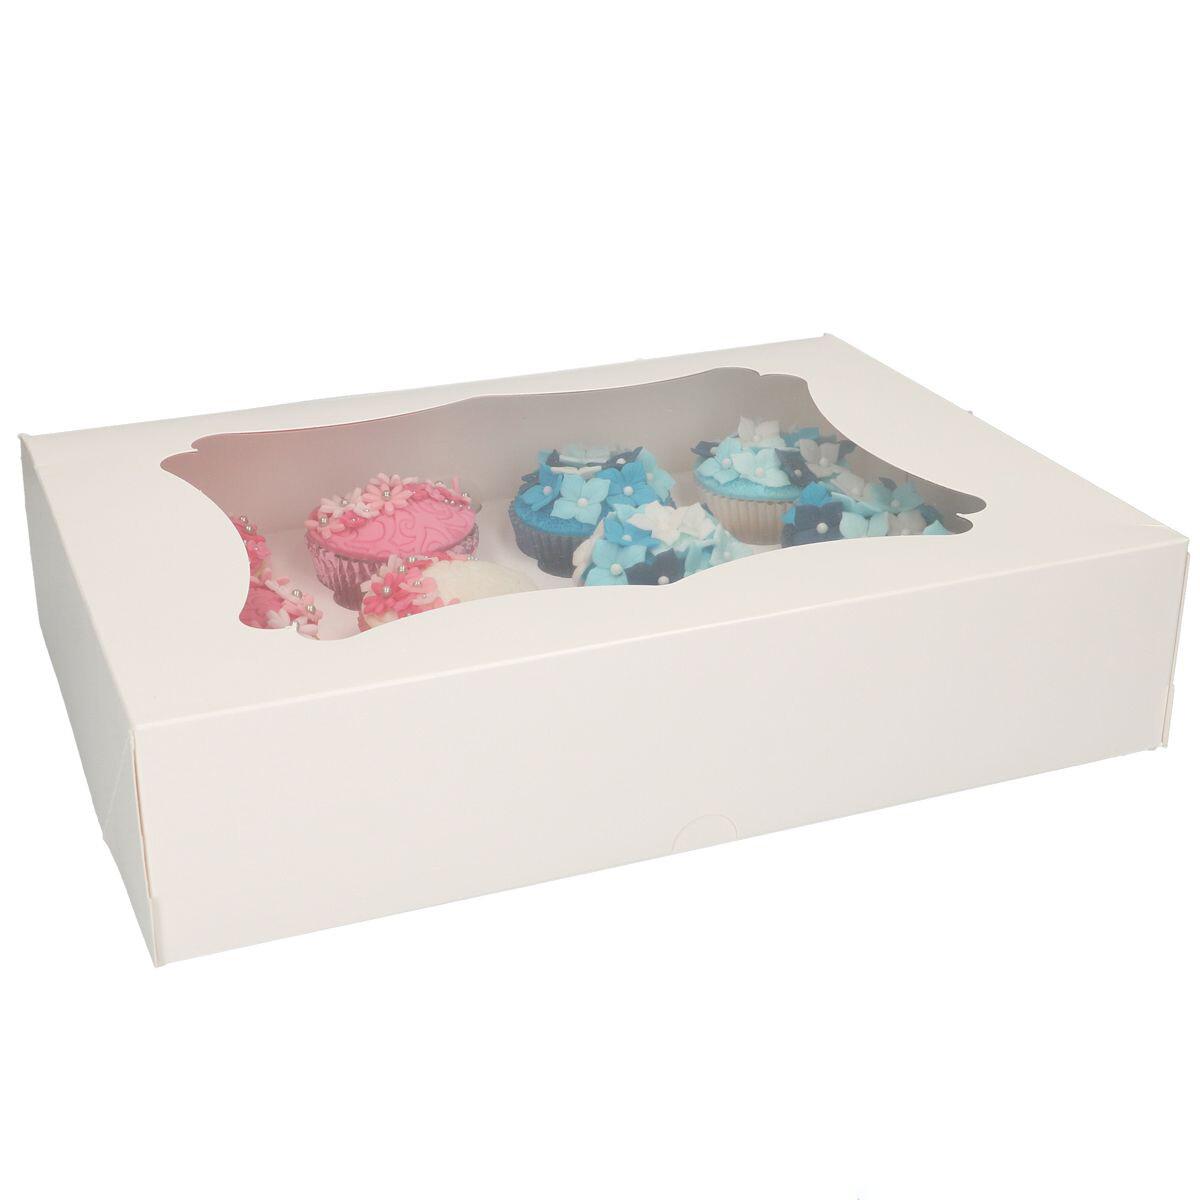 Box for 12 Cupcakes/Muffins -Κουτί για 12 Καπκέϊκς/Μάφινς